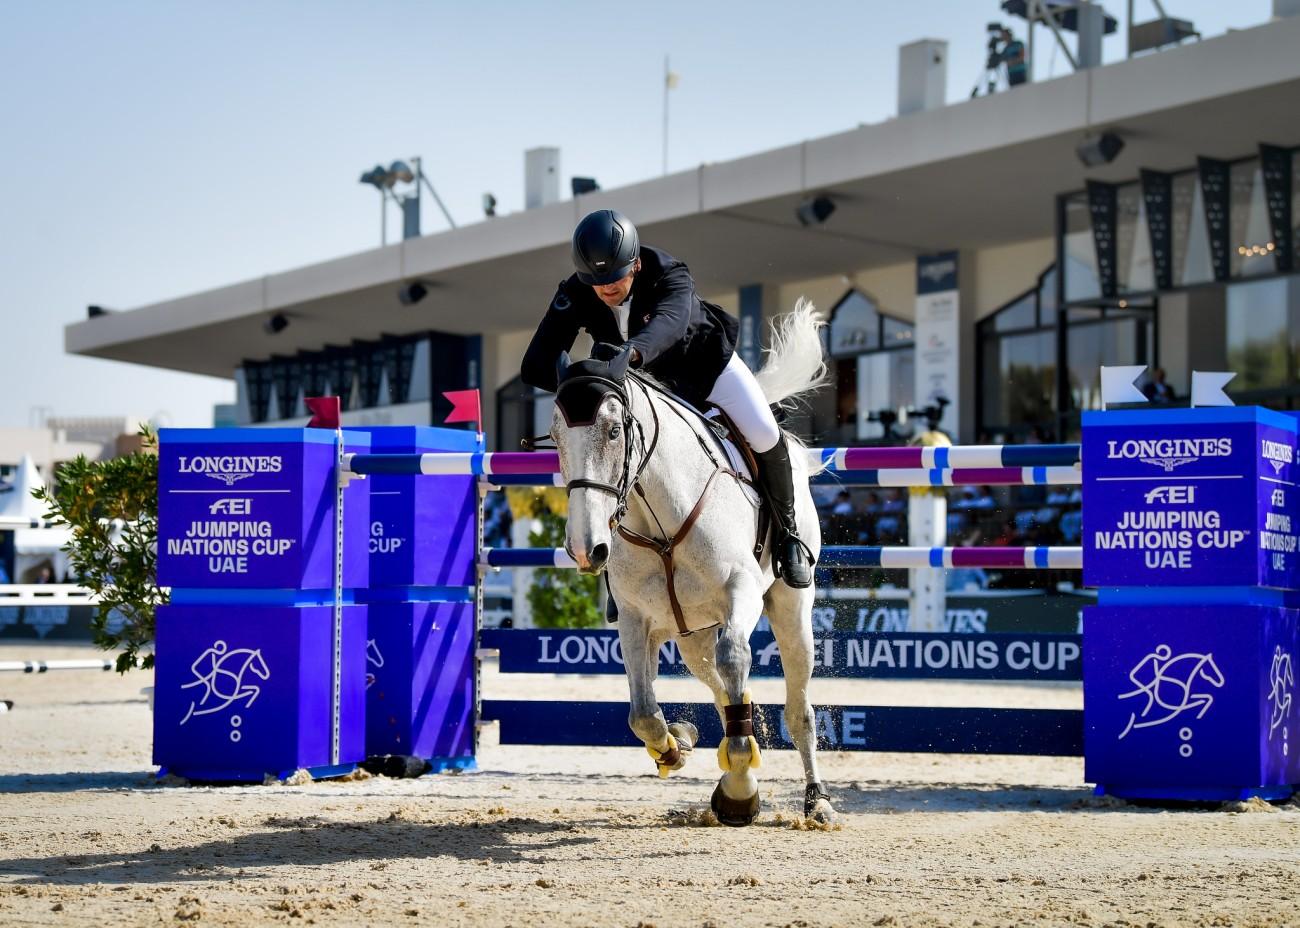 2020.03.01.99.99 Abu Dhabi CSIO 5 FEI NC Tom Tarver-Priebe & Popeye FEI Helen Cruden